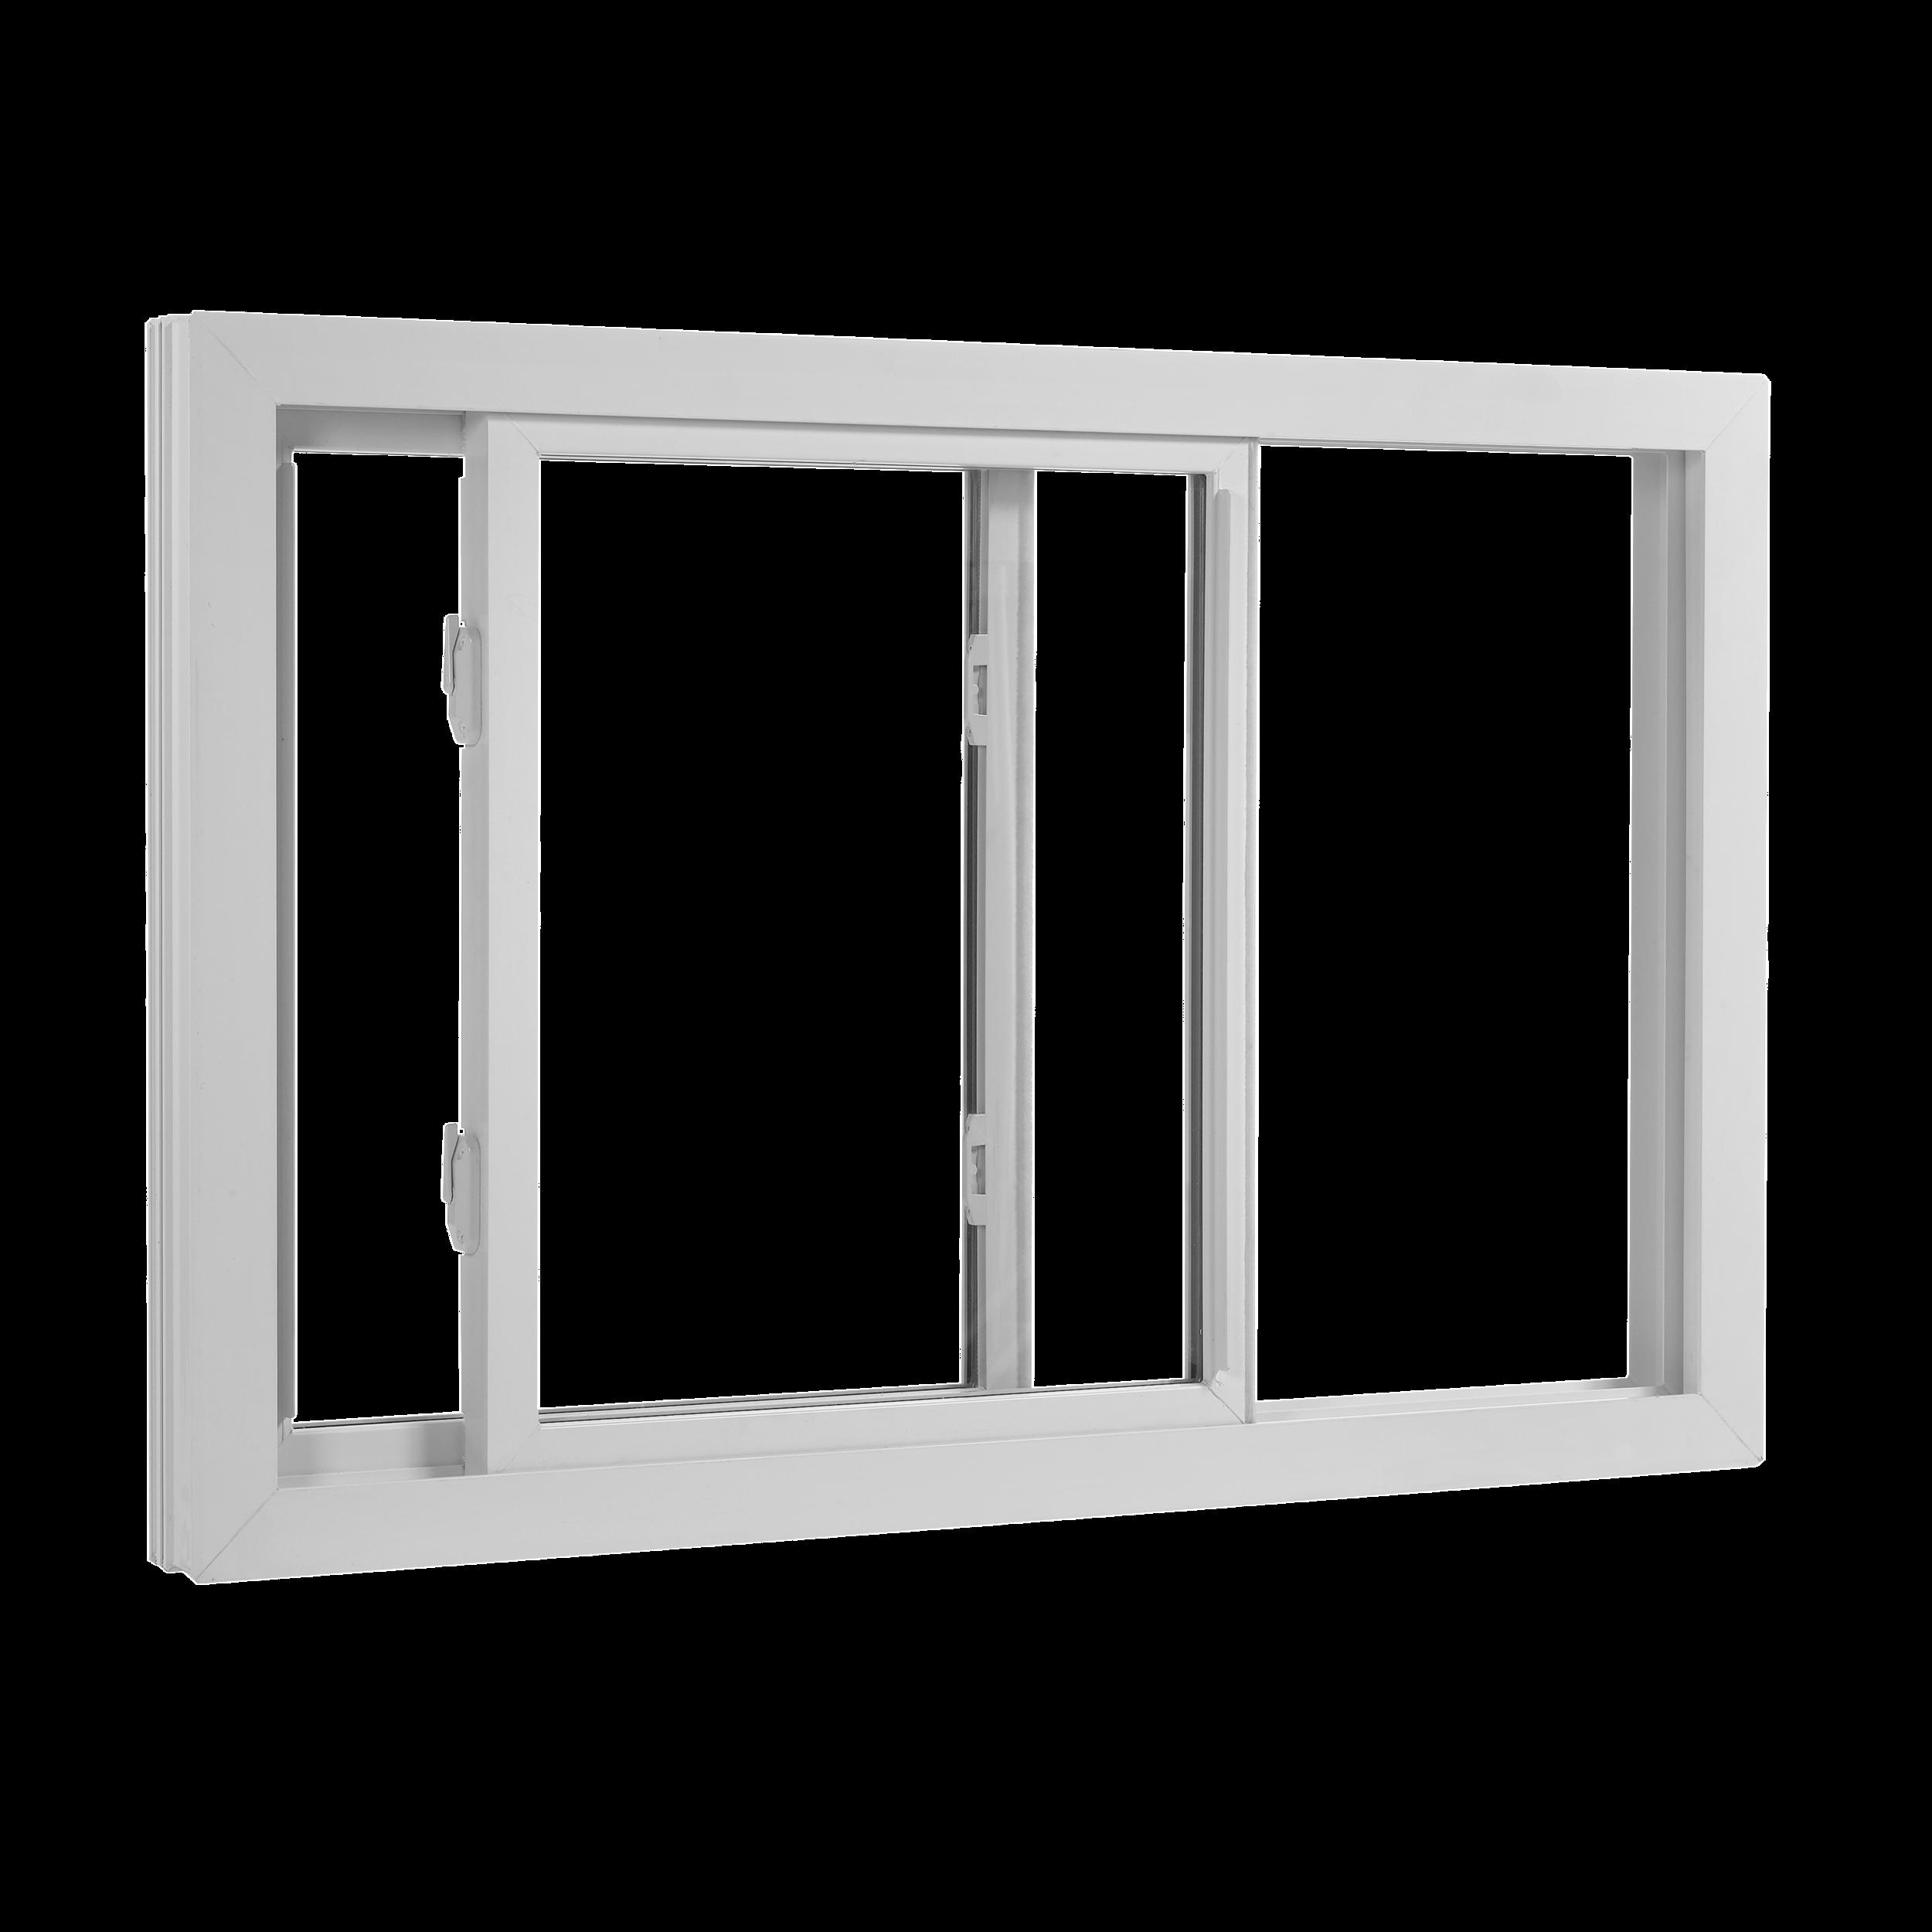 Wallside Windows® — The Leader in Vinyl Replacement Windows